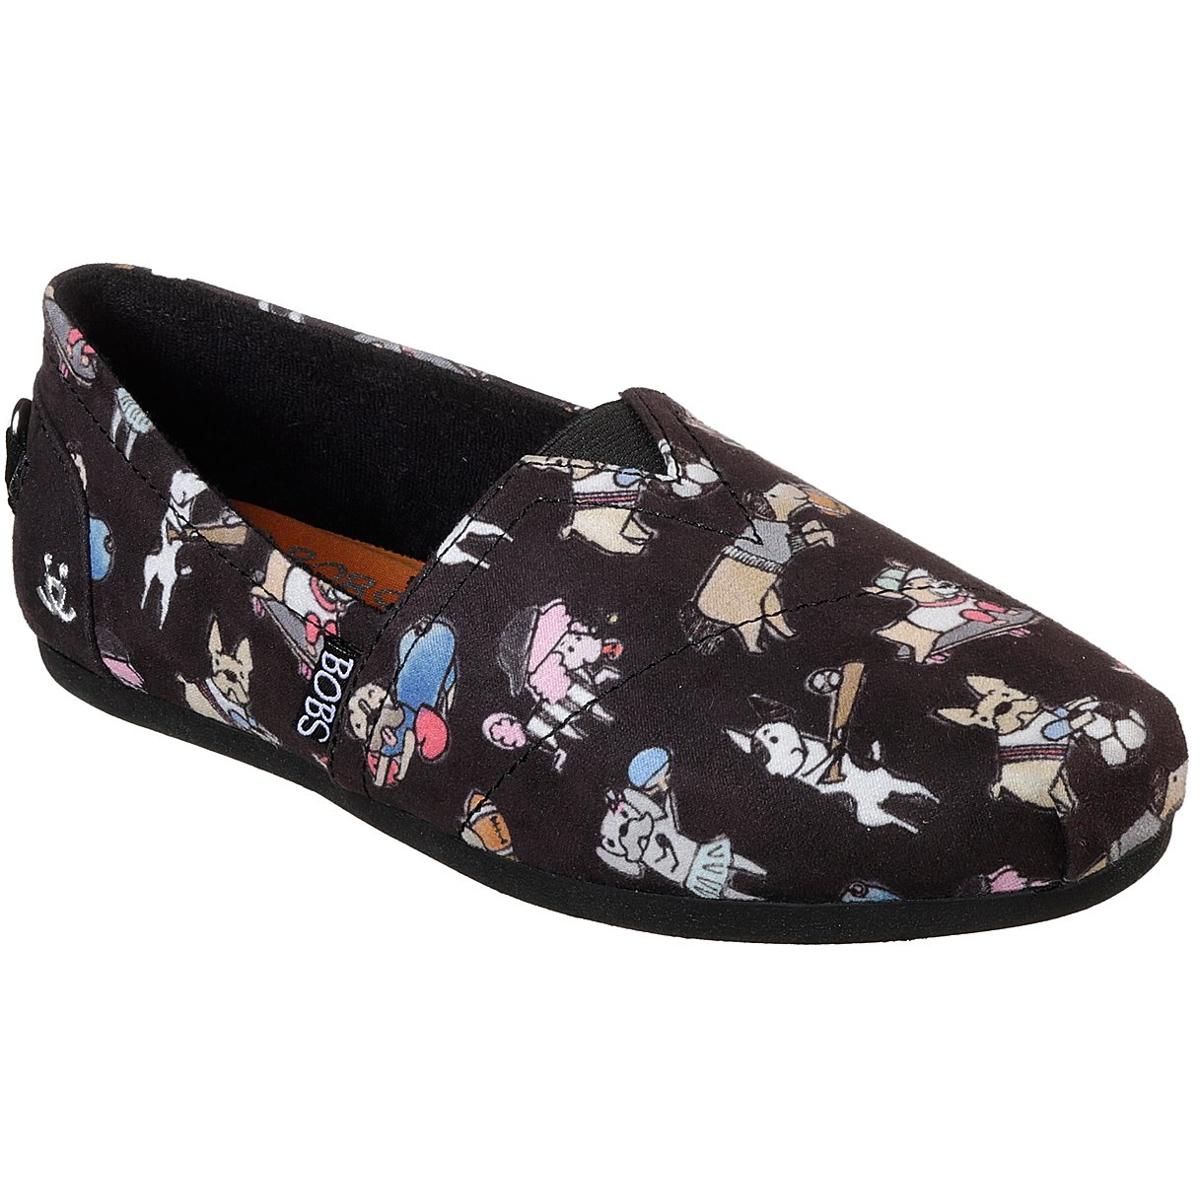 Skechers Women's Bobs Plush - Go Fetch Casual Slip-On Shoes - Black, 9